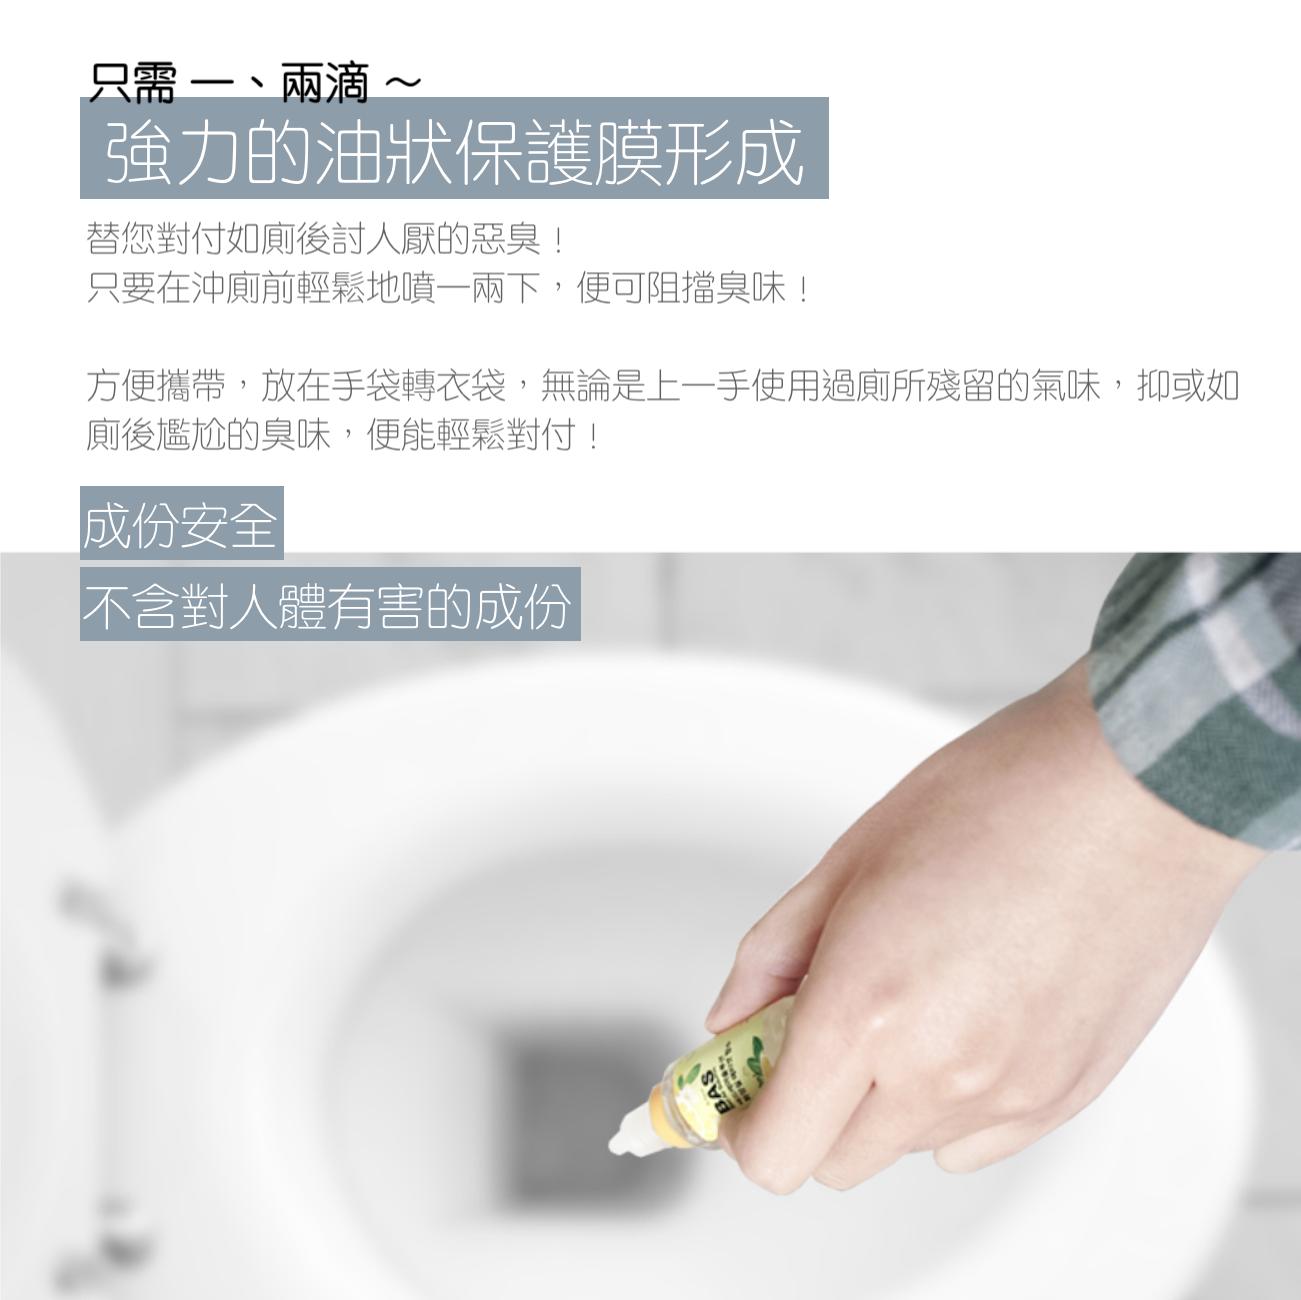 [shiPAPA] 廁所芳香劑 20ml 2 Flavours|韓國直送|香港 澳門